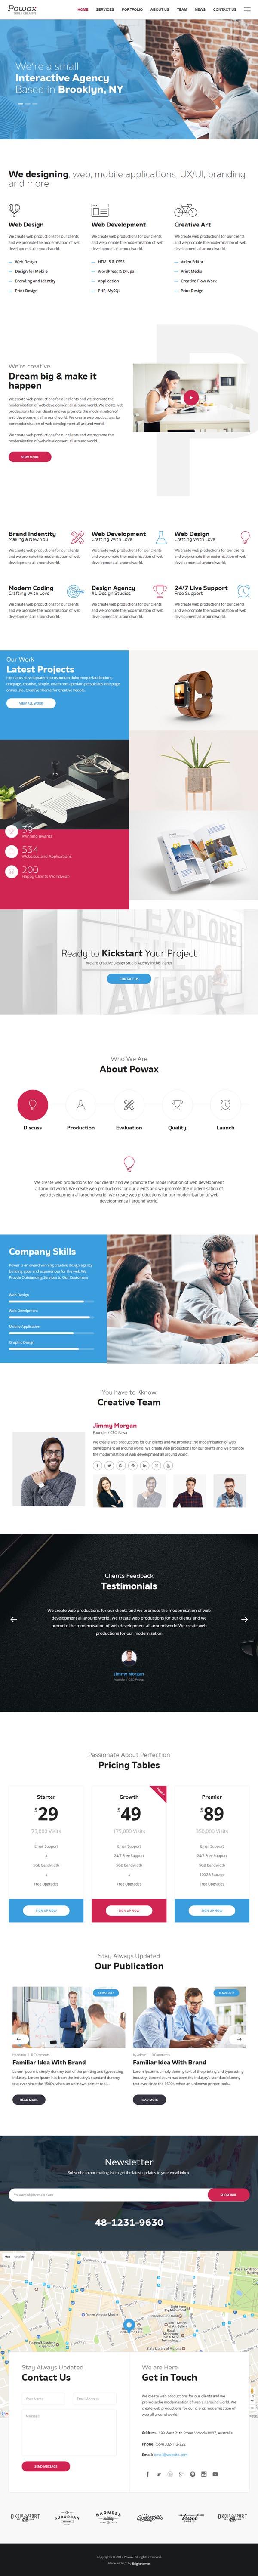 Powax – One Page Parallax WordPress Theme